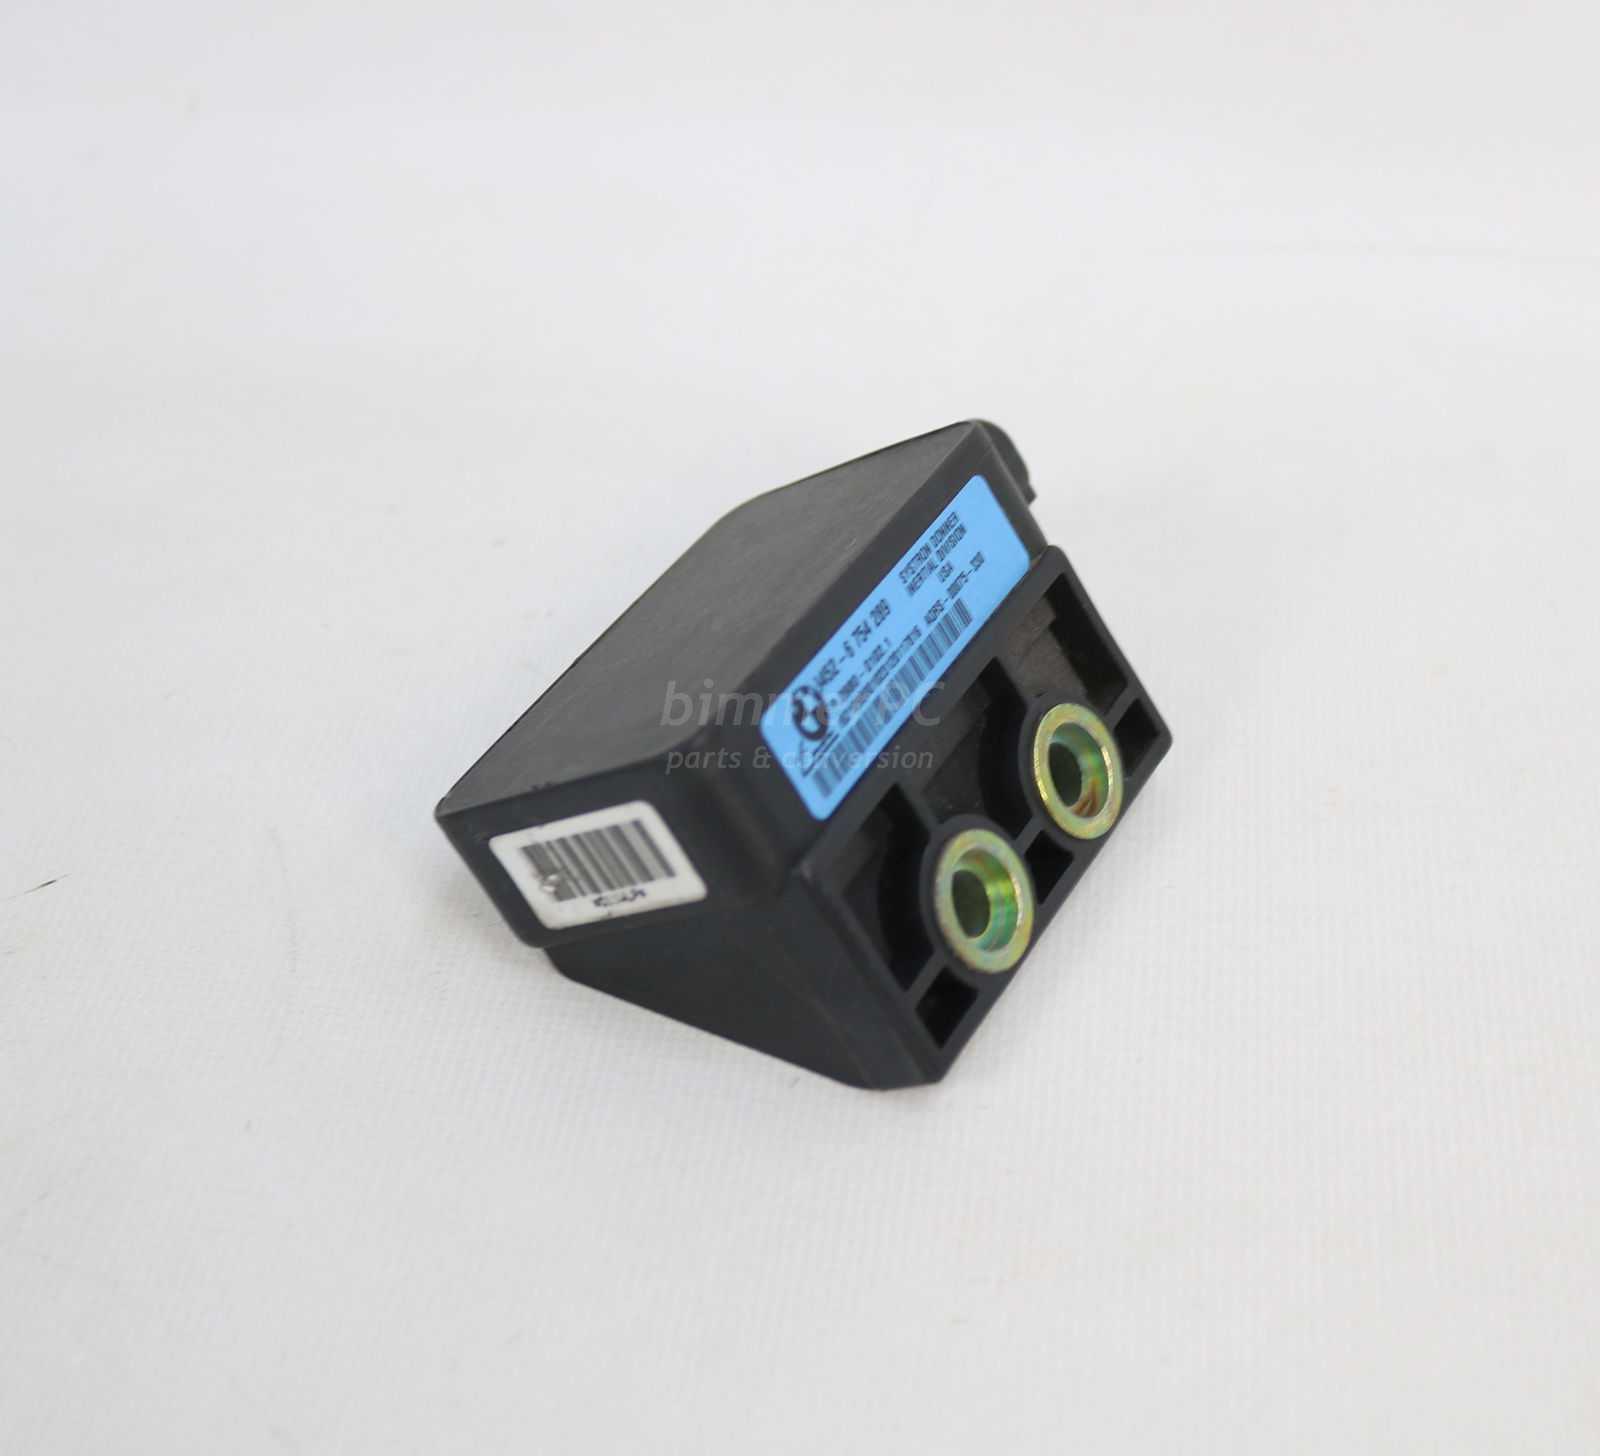 BMW E46 E36 Z3 ABS DSC Rotational Speed Inertial Yaw Sensor Module 1999-2002 OEM image 5